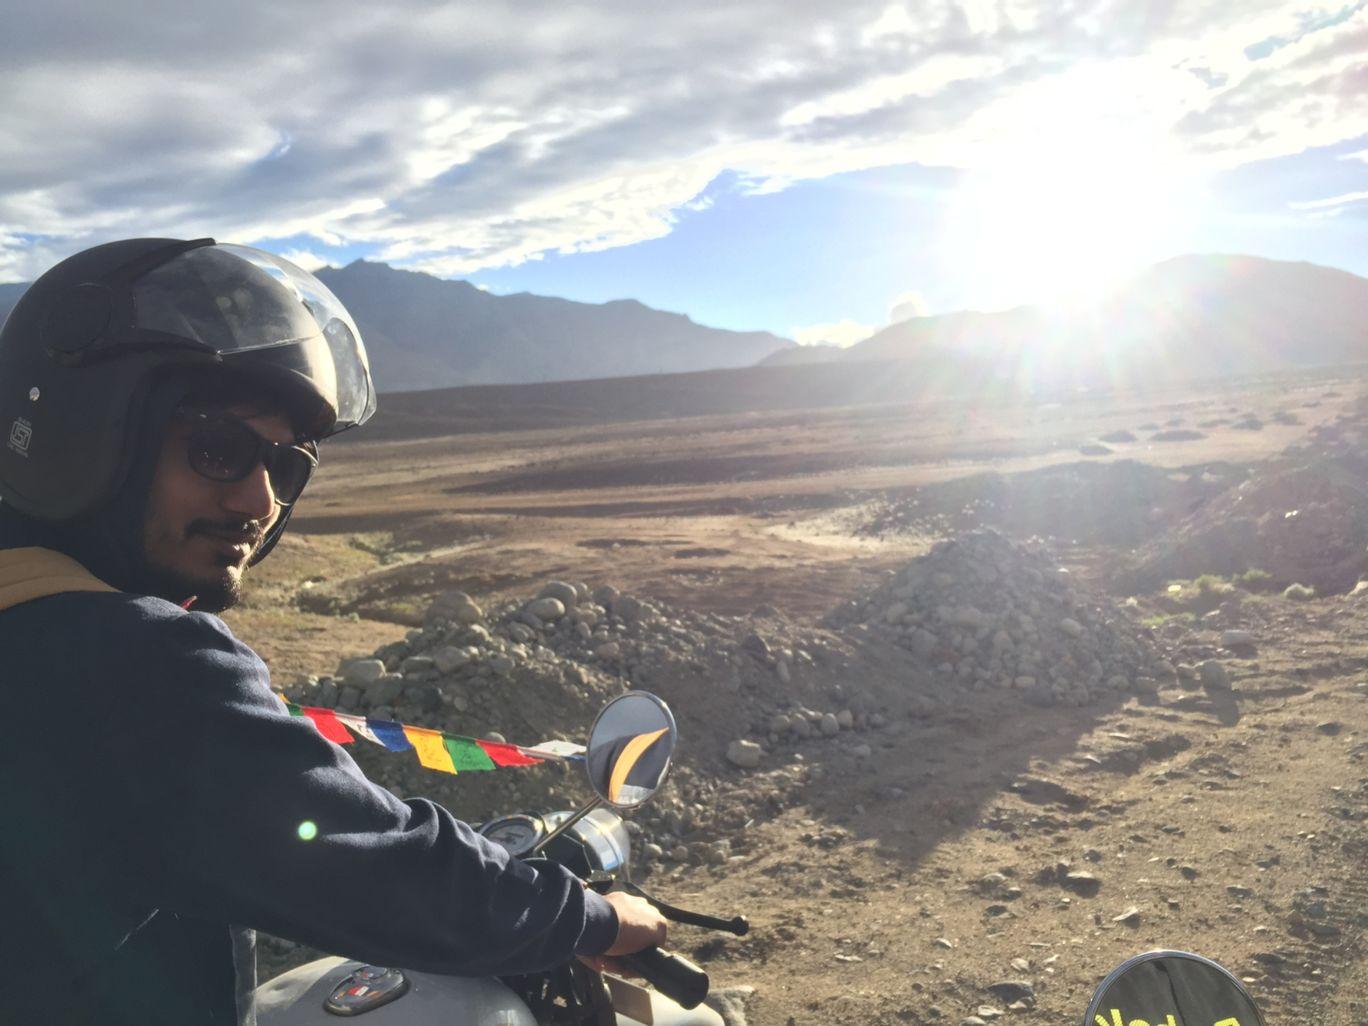 Photo of Srinagar - Leh Highway By Harsh Vardhan